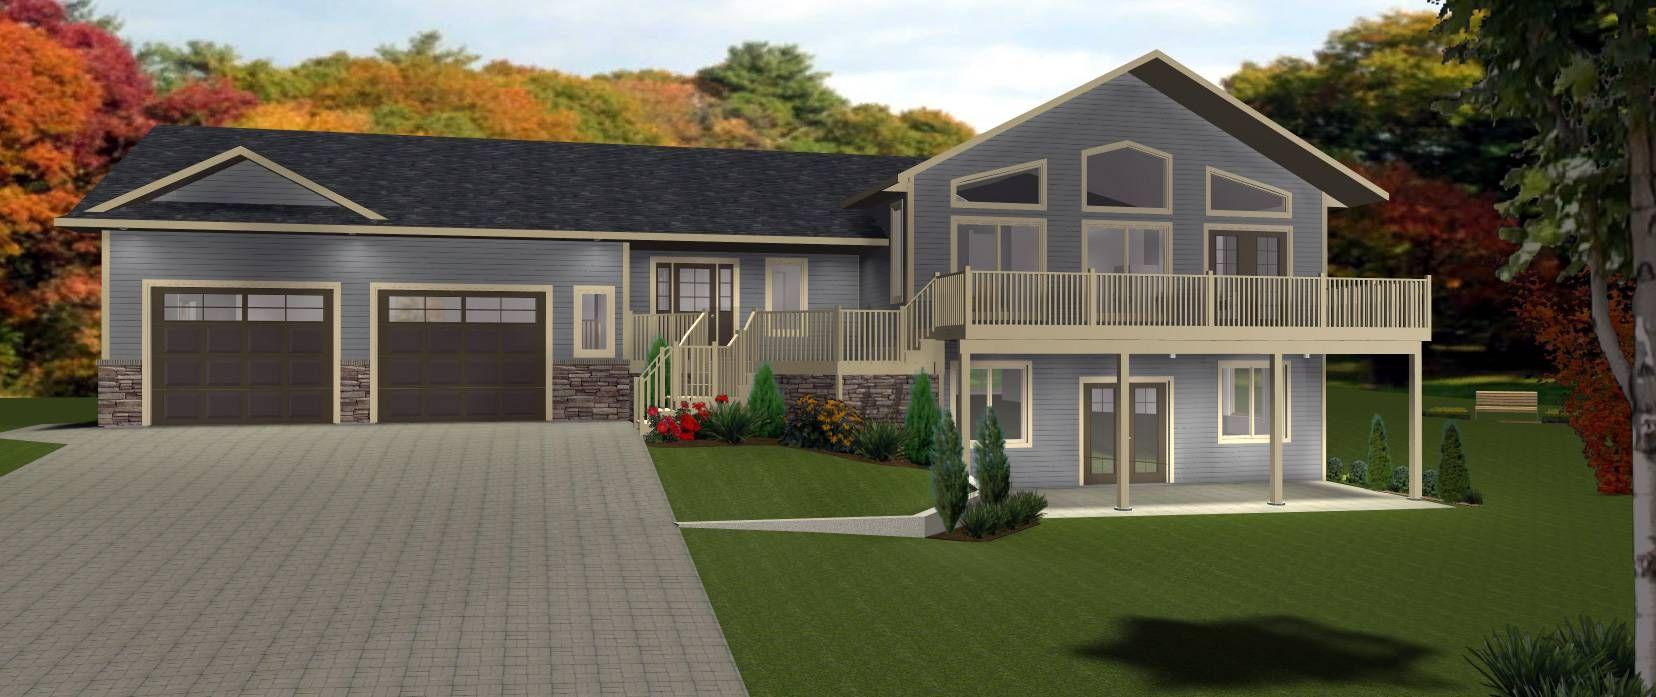 Pin On Basement House Plans